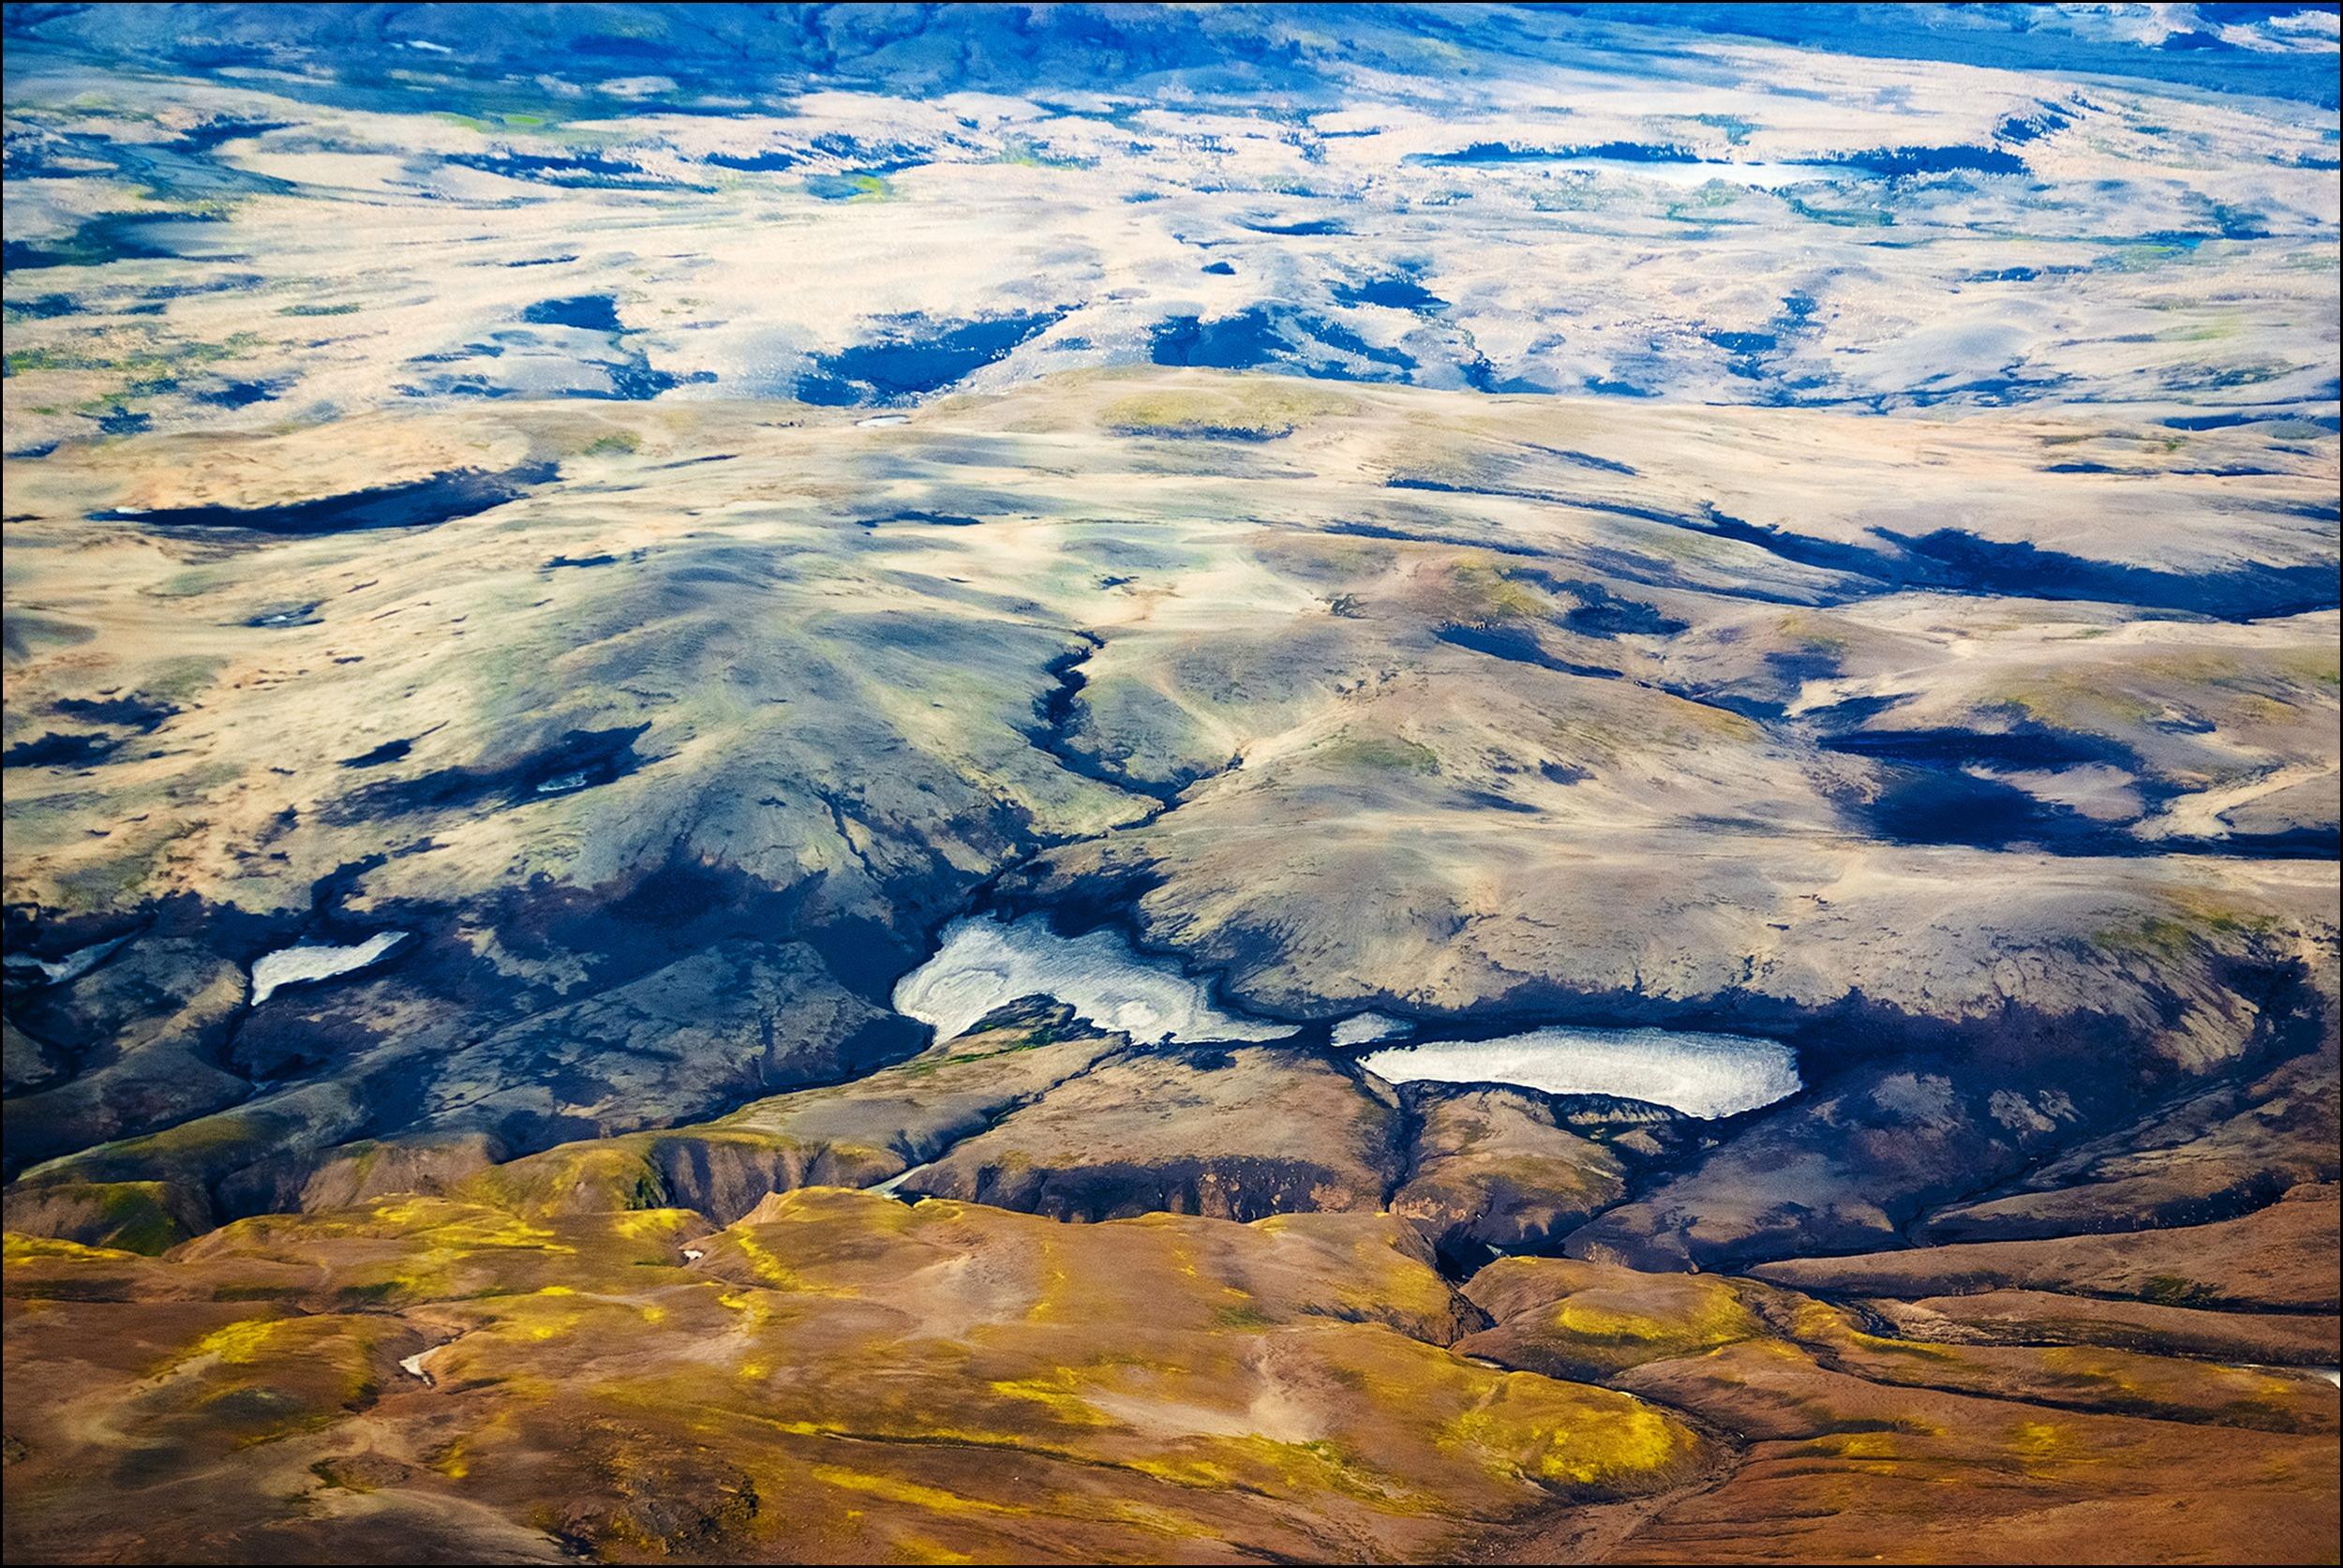 iceland landforms